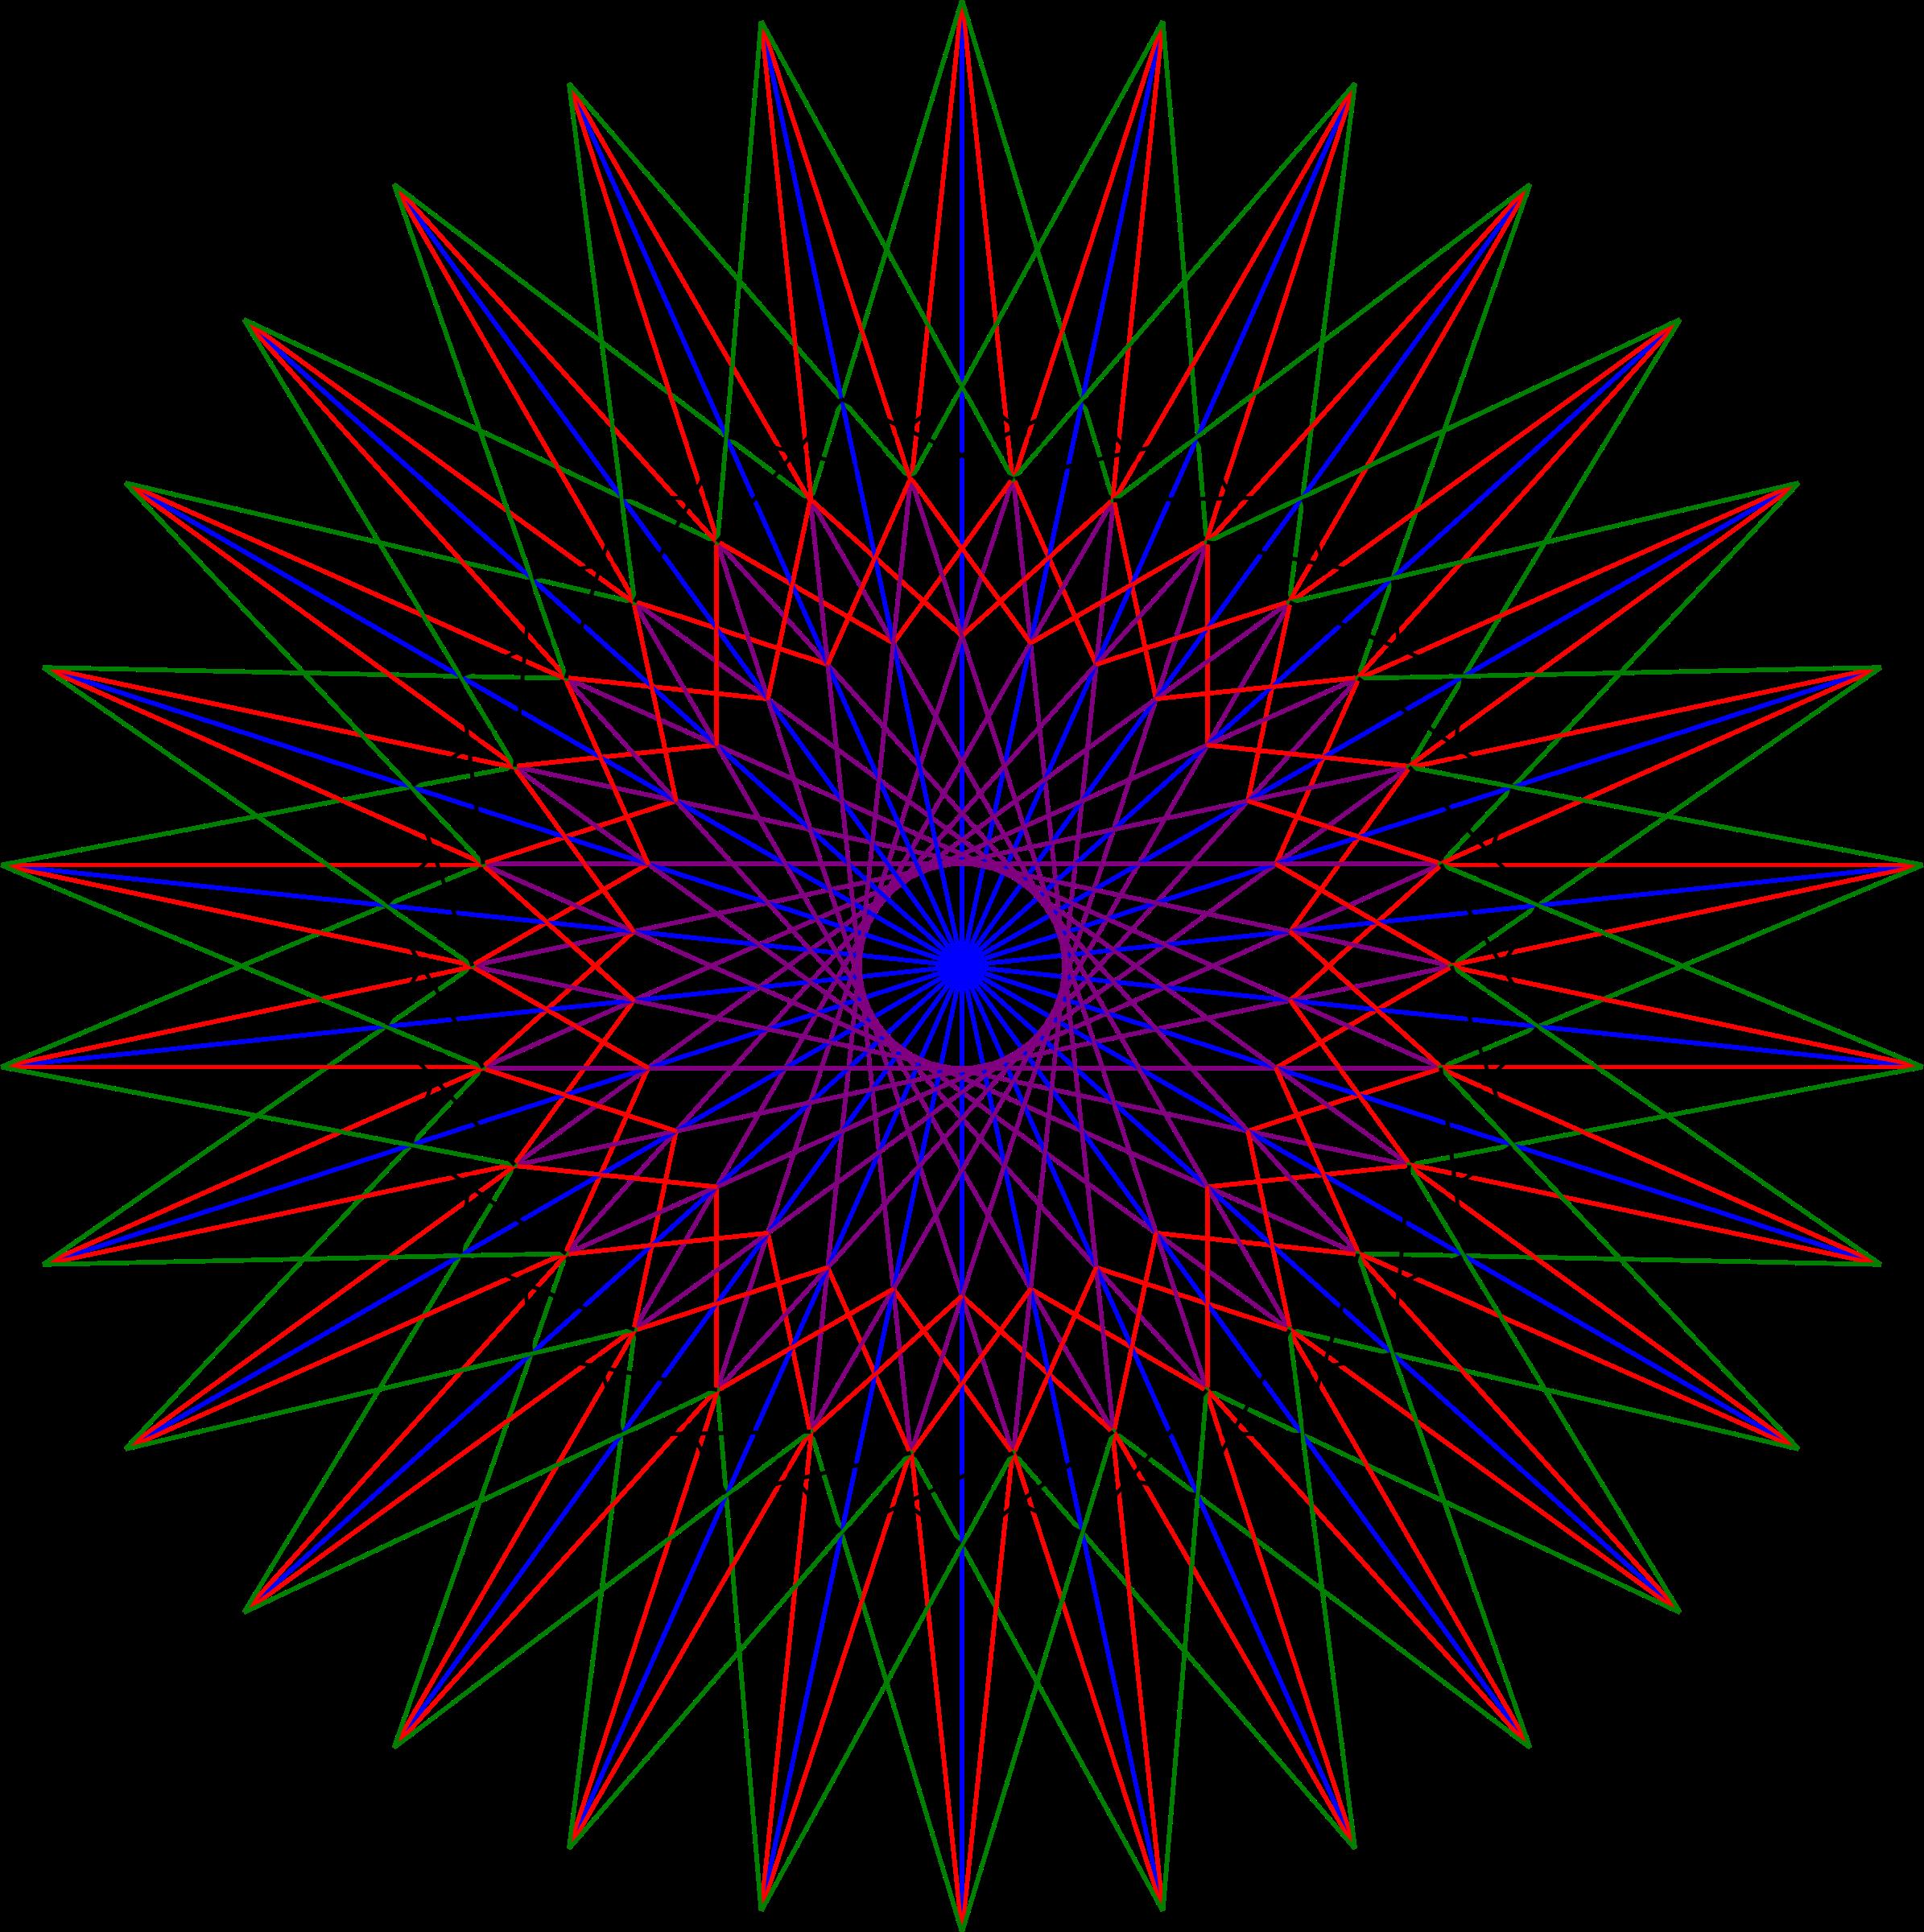 Star big image png. Florida clipart string art